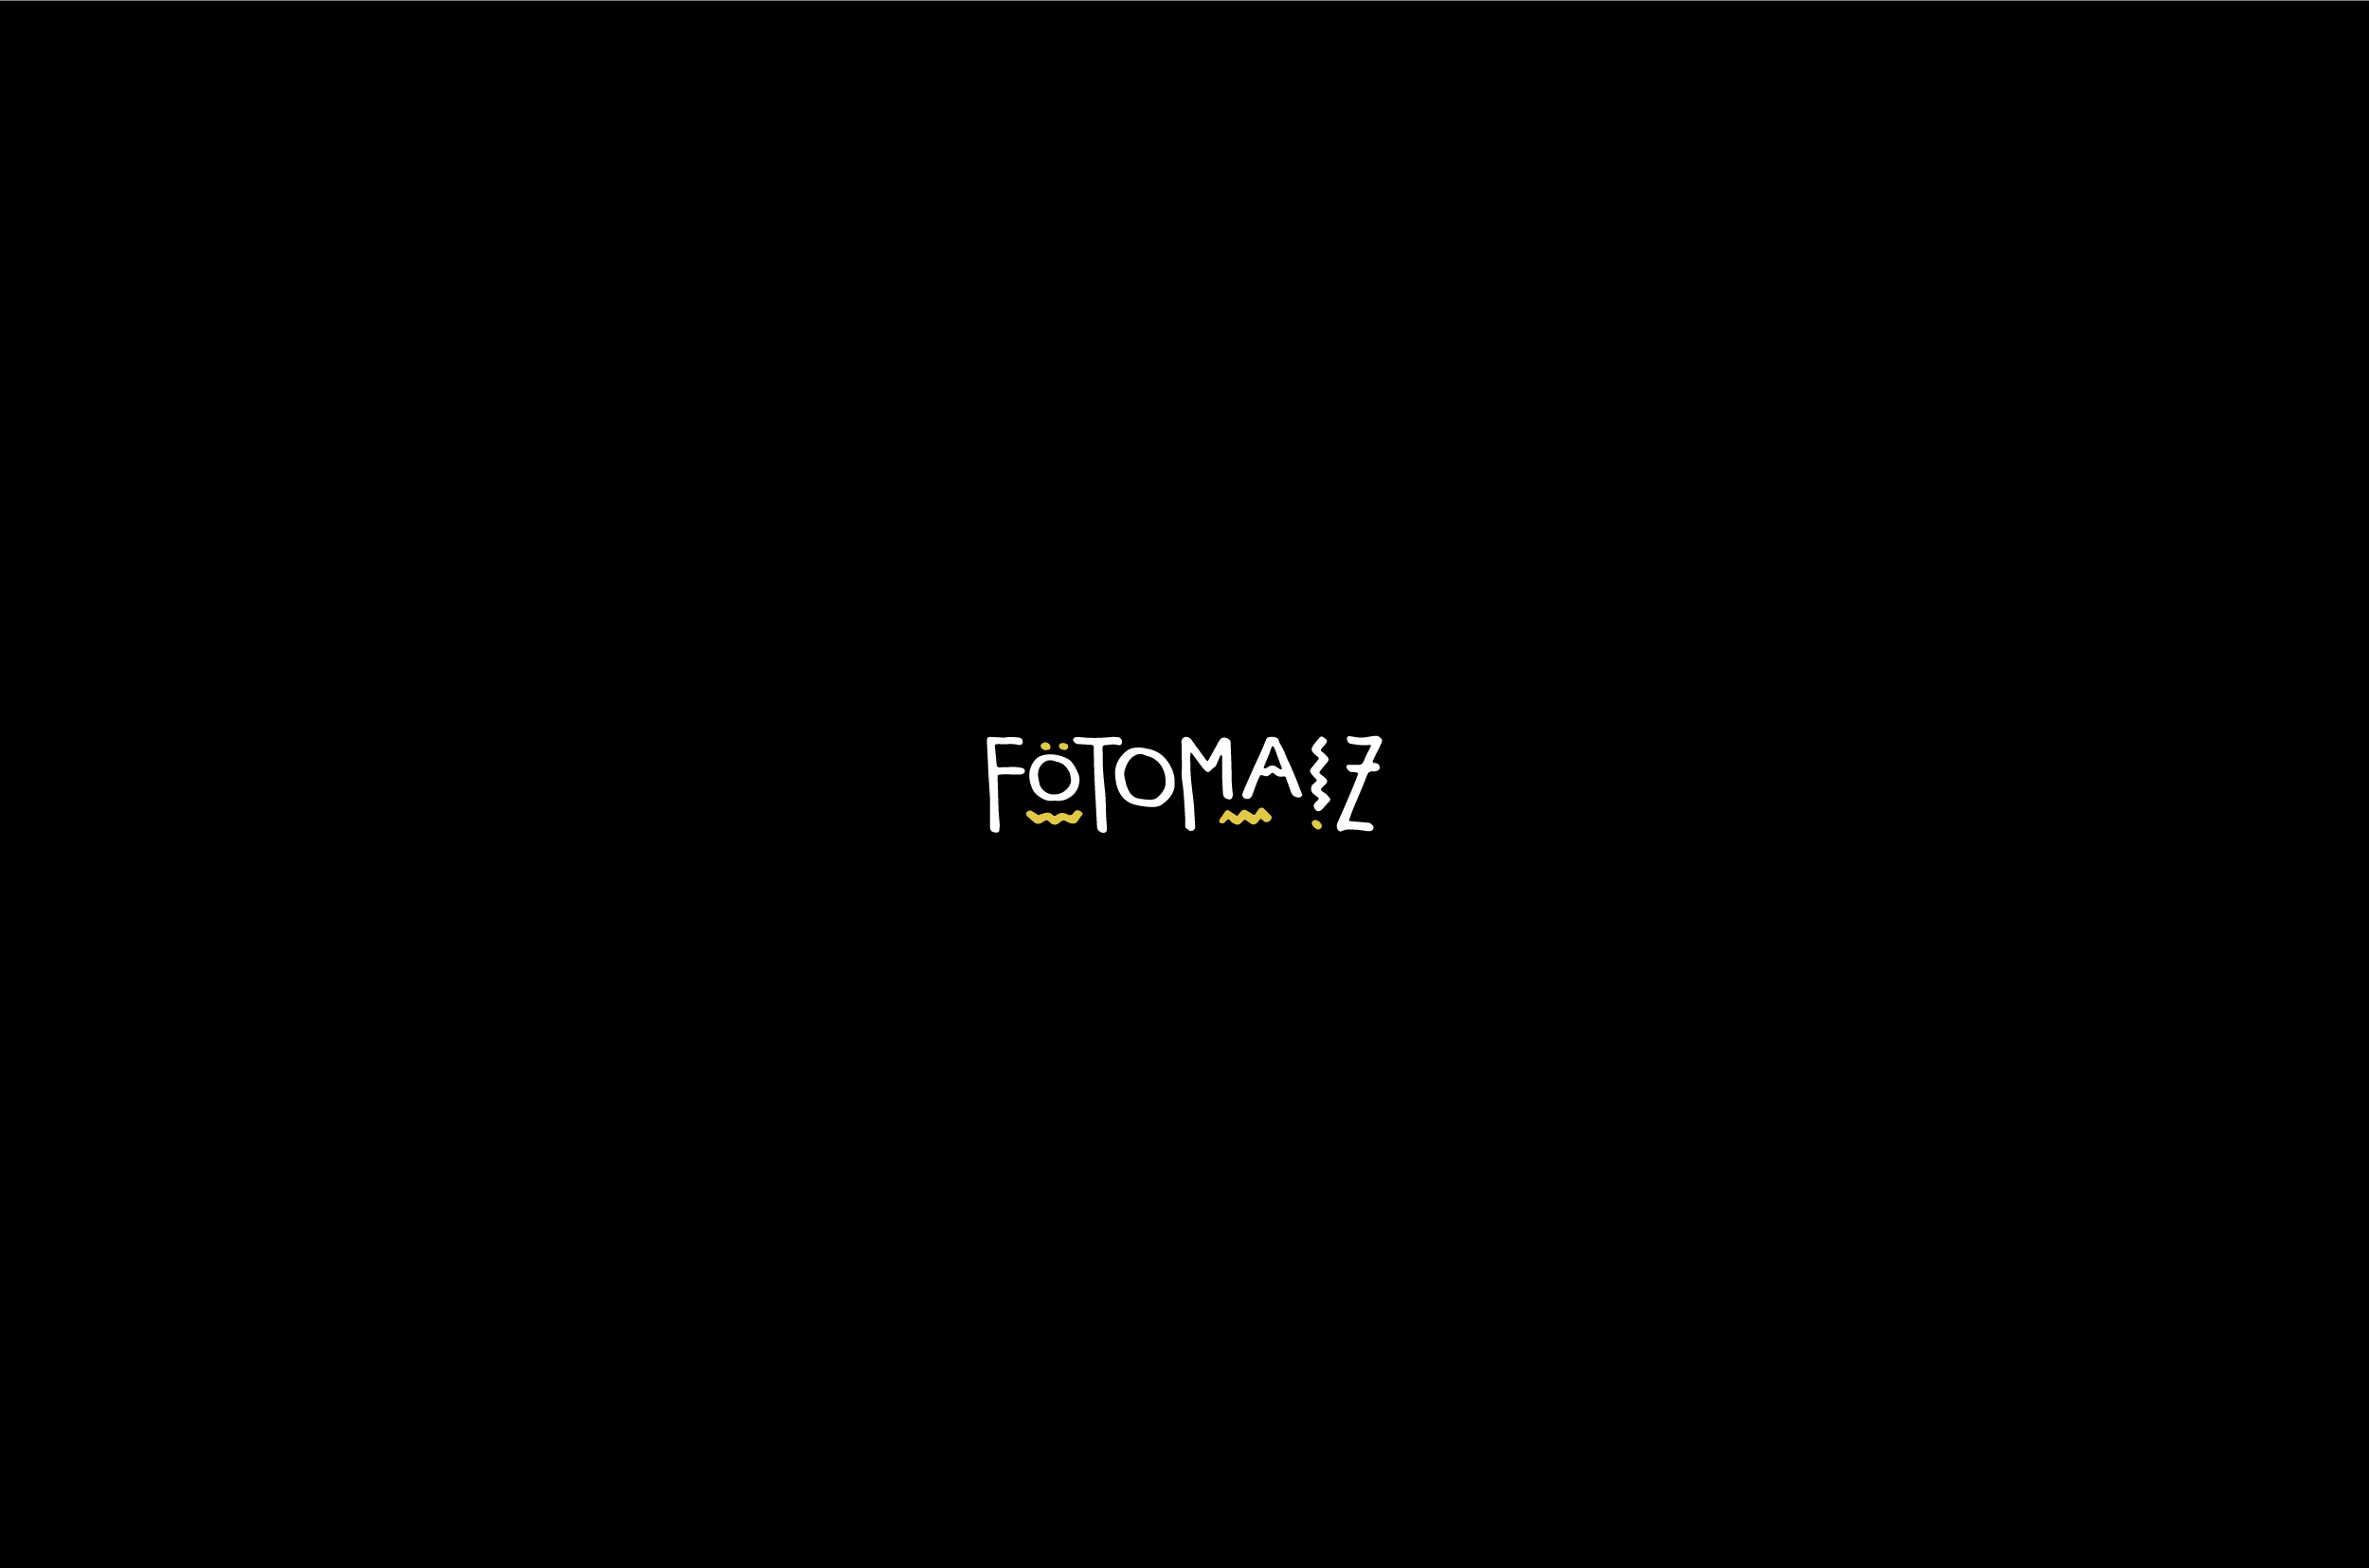 Fotomaiz